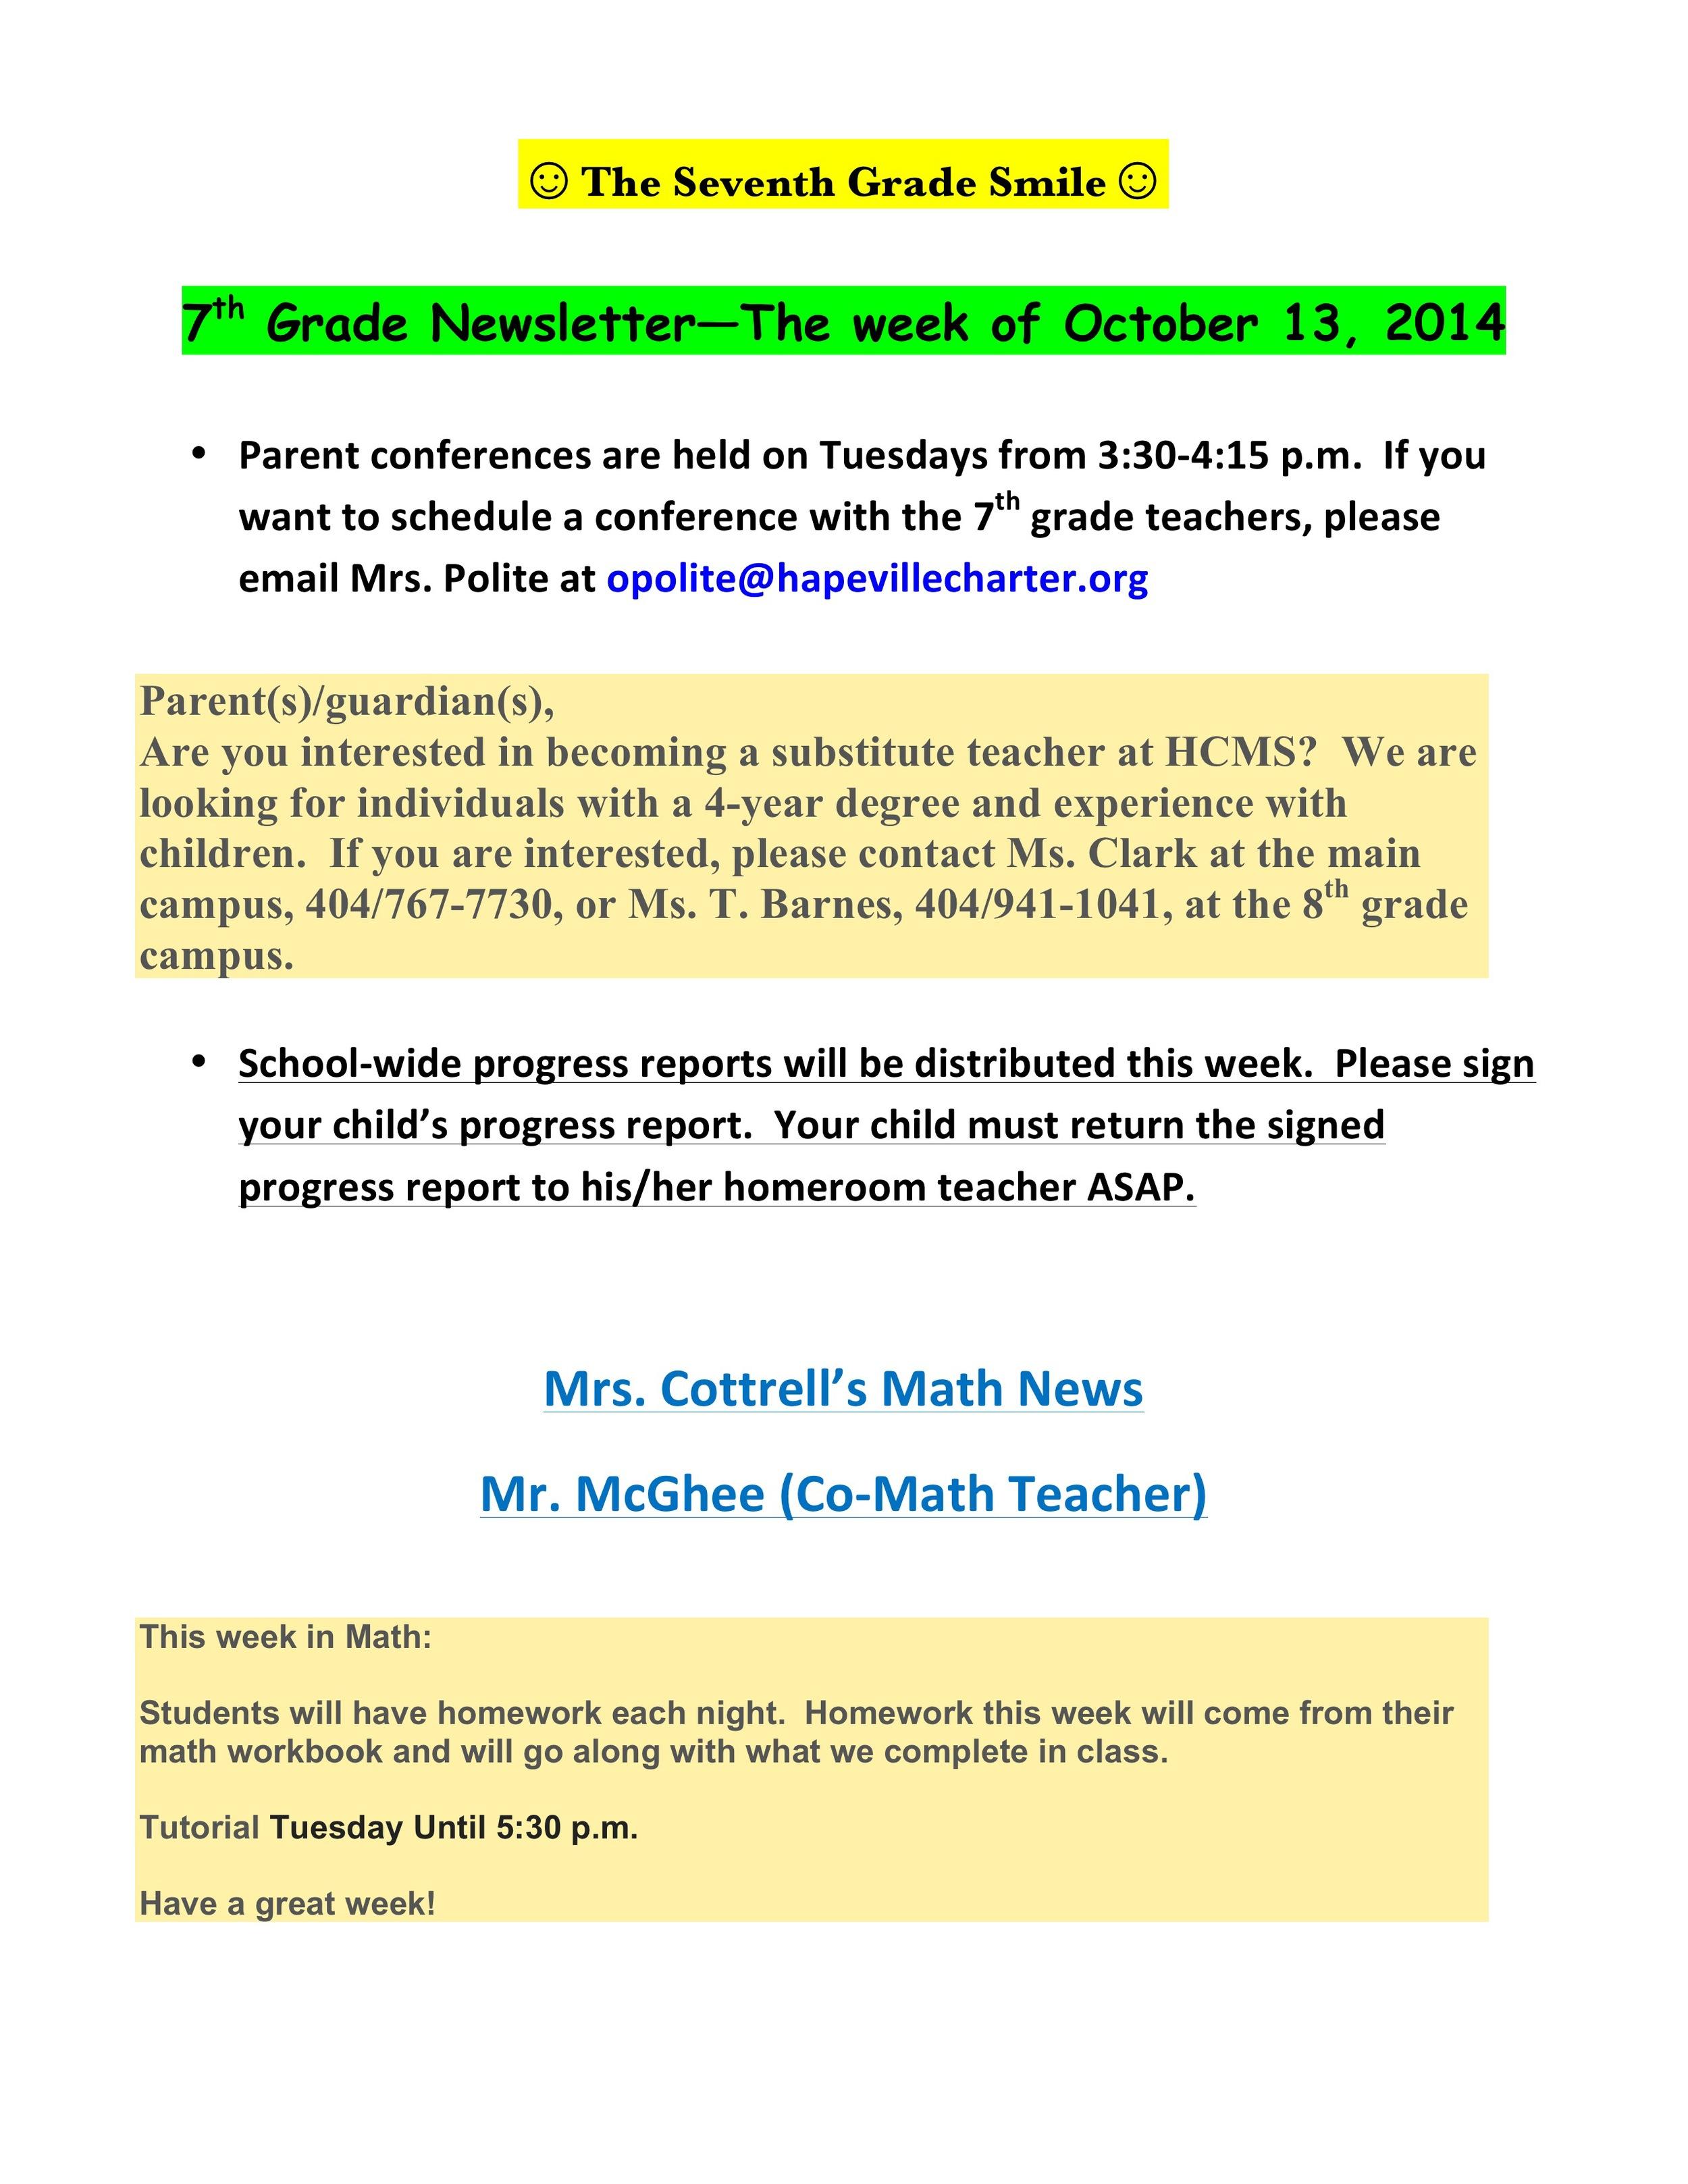 Newsletter Image7th grade October 13th 2014.jpeg